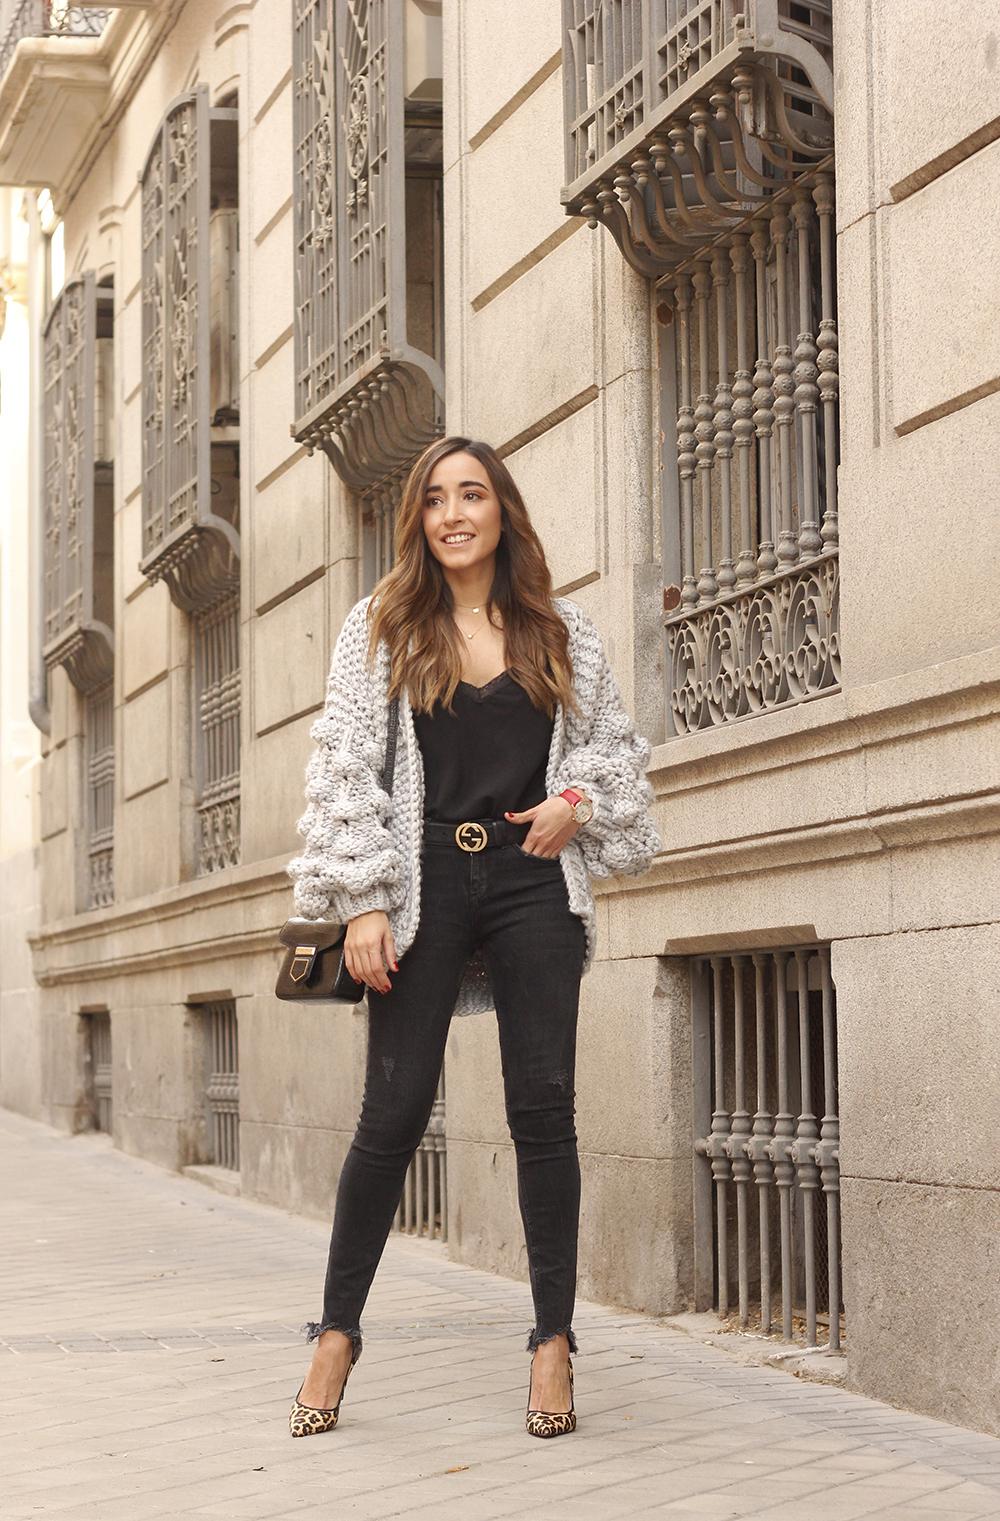 Grey cardigan black jeans folli folie watch leopard print heels starbucks tea street style fall outfit 201805